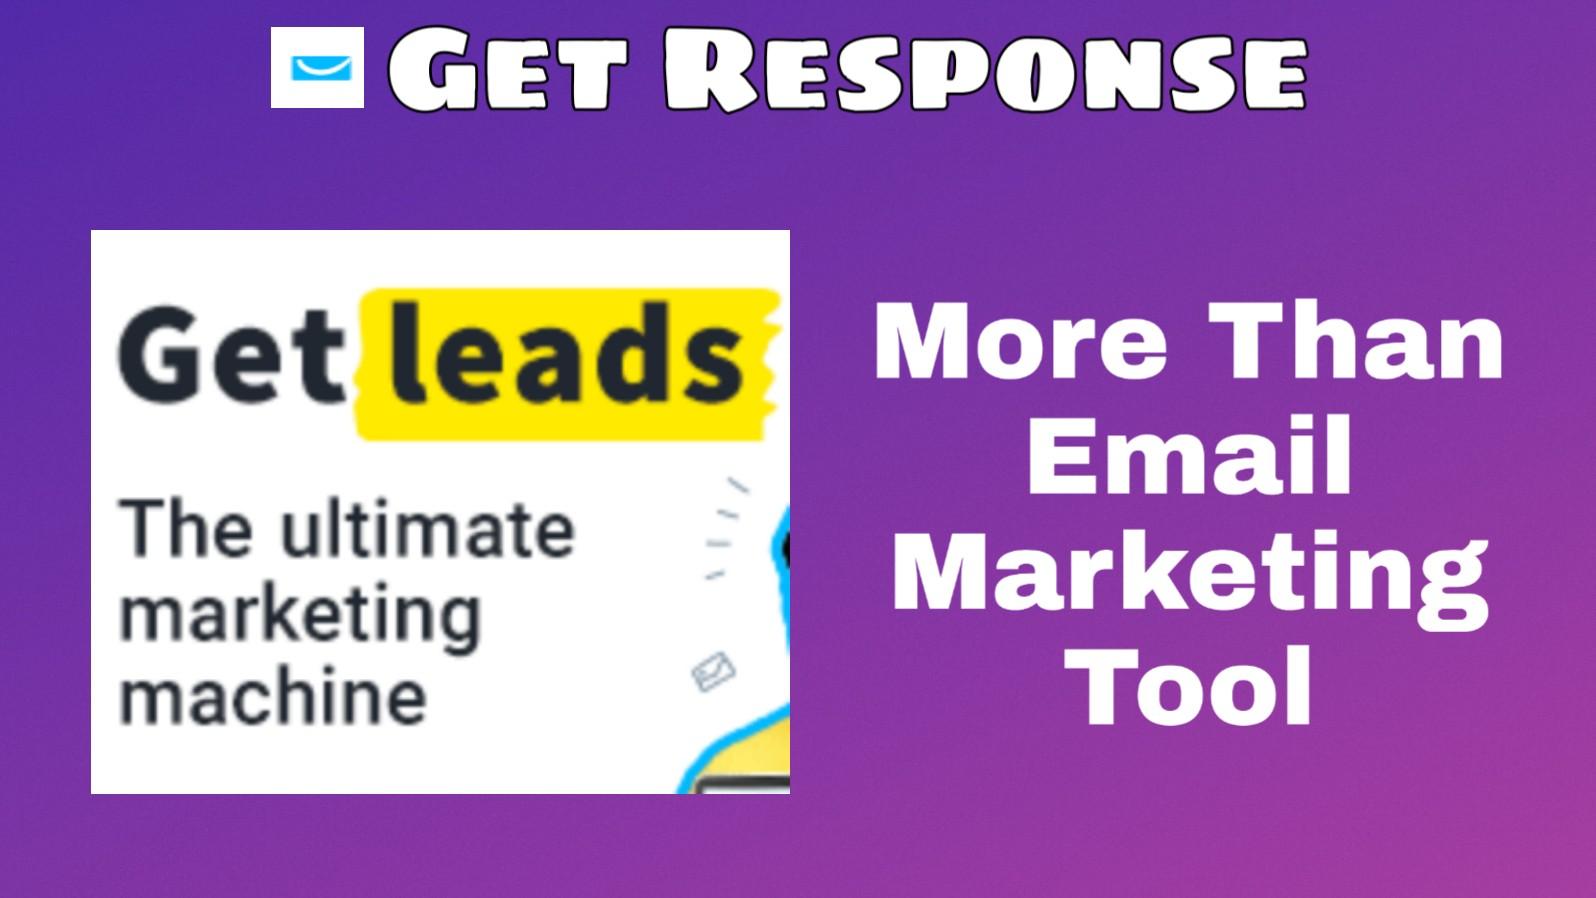 Getresponse - more than email marketing